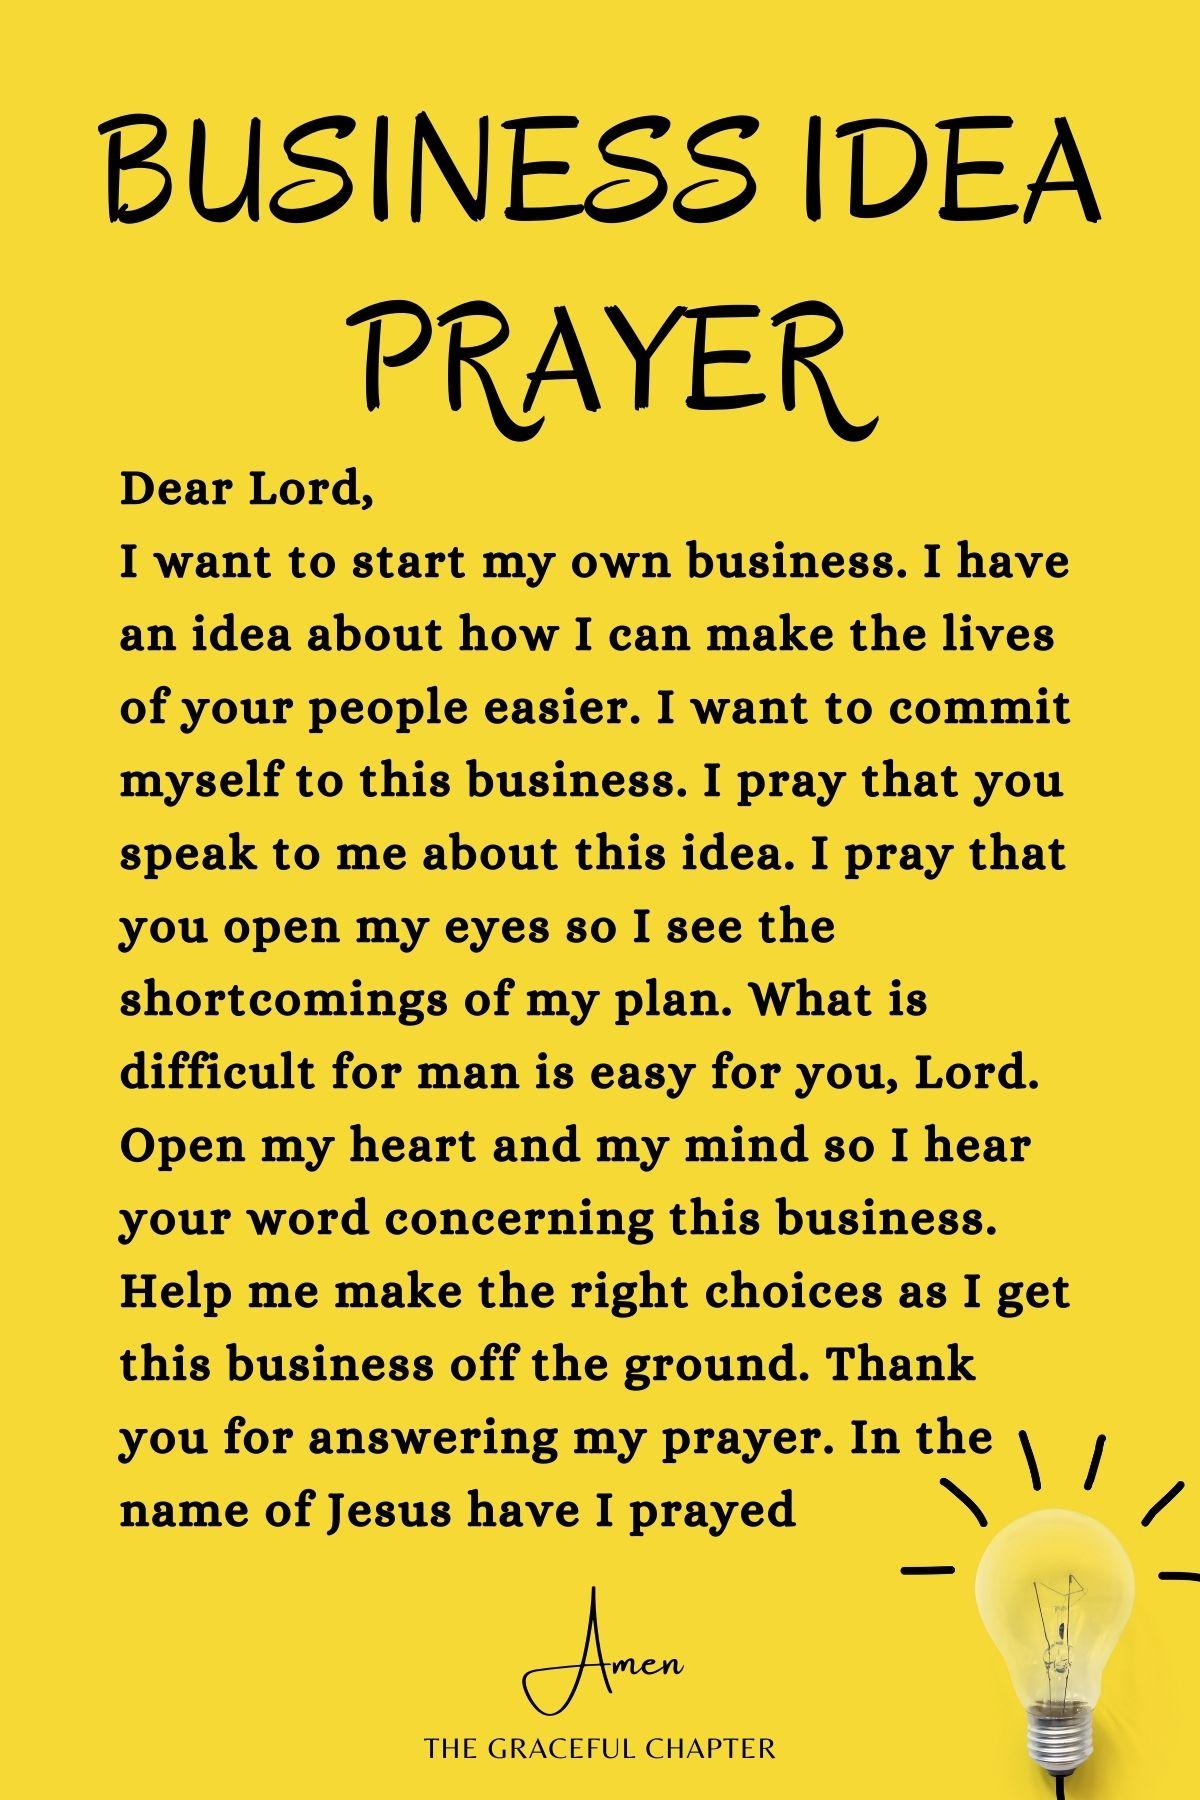 Business idea prayer